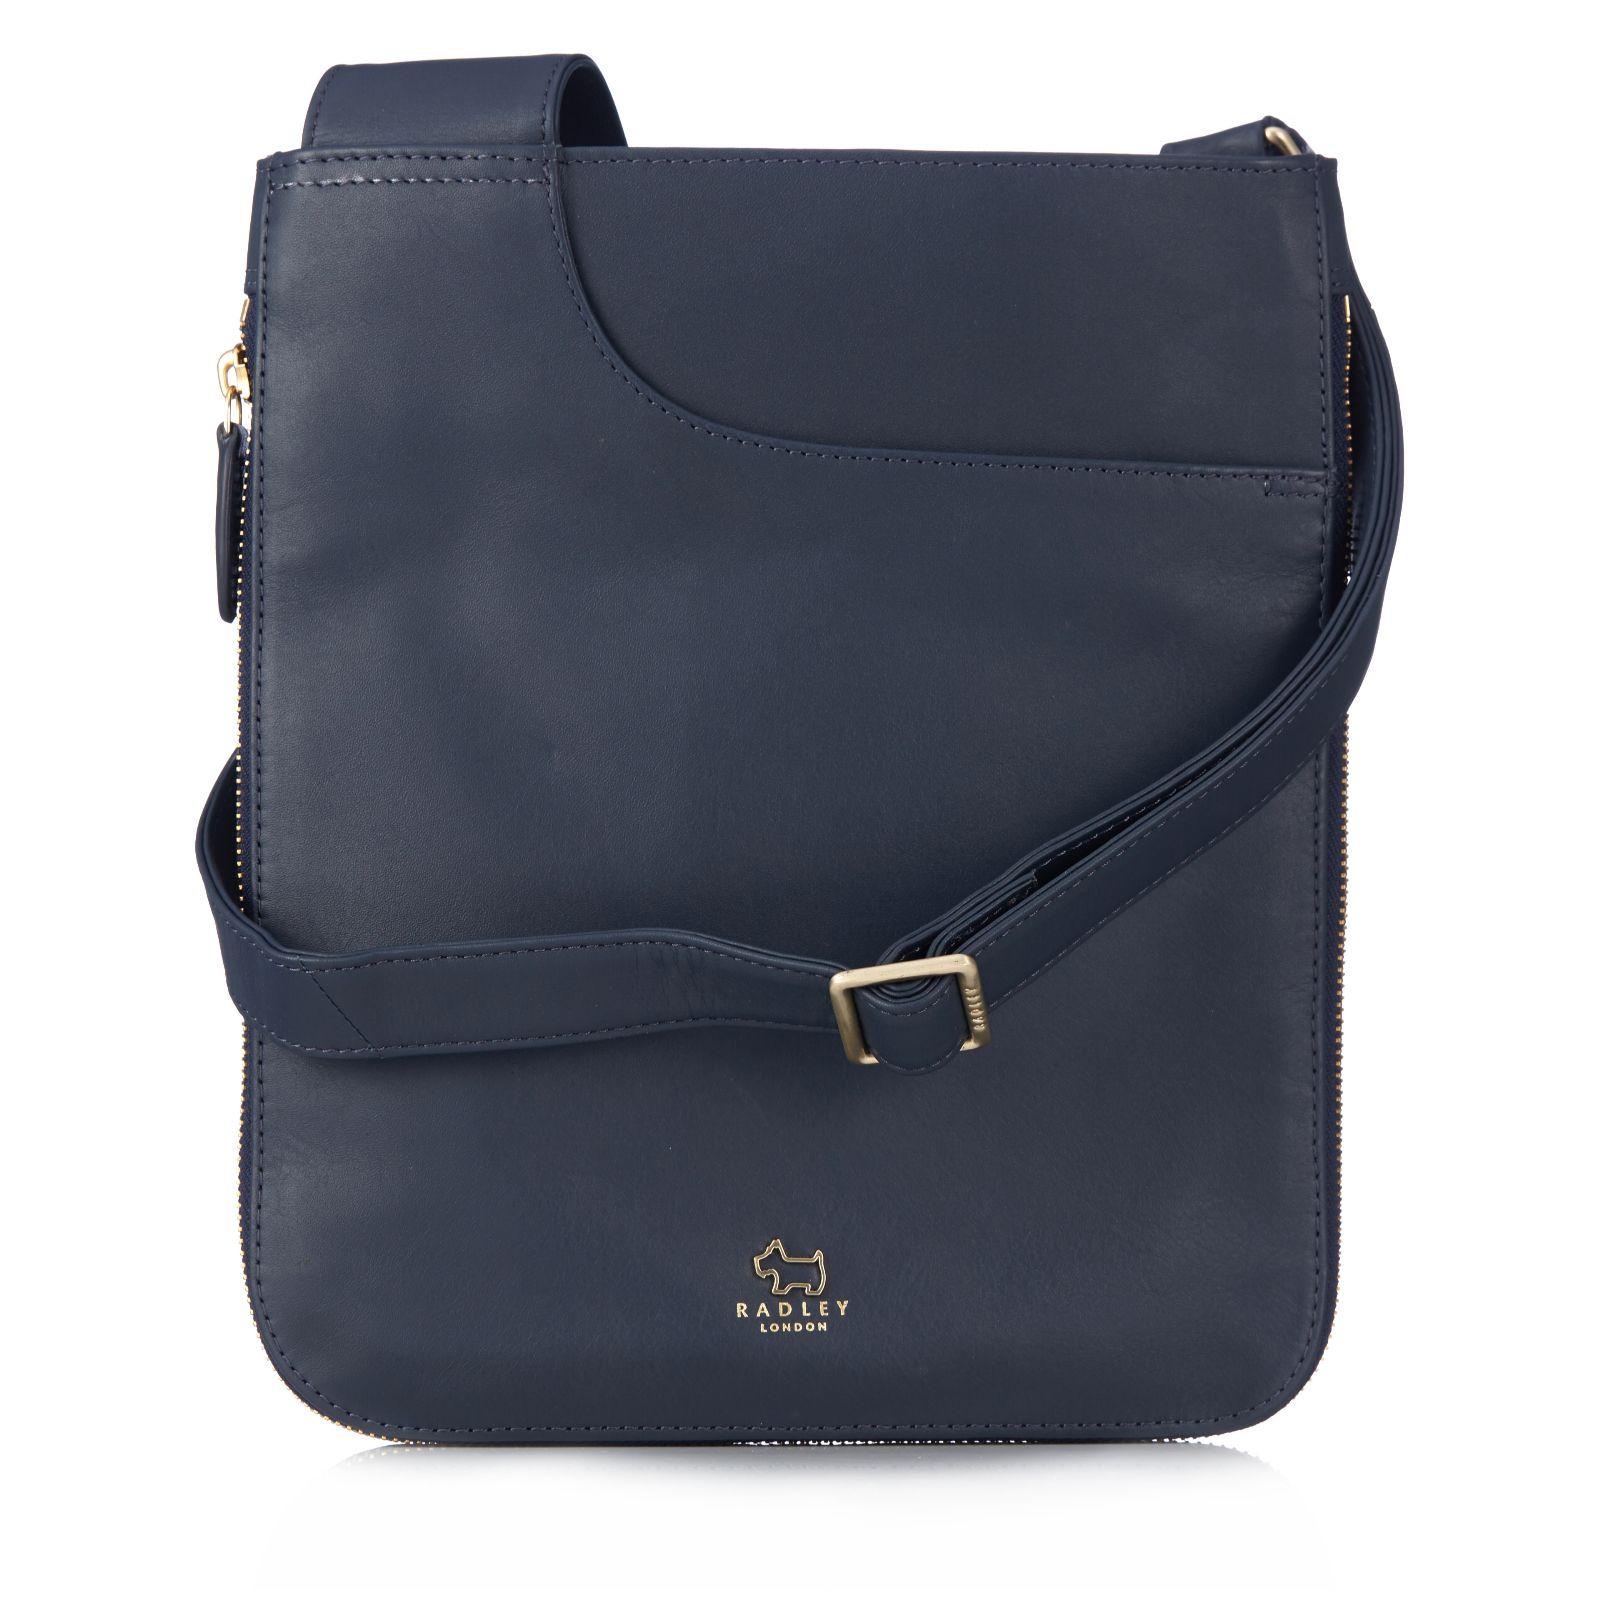 c93002288b1ab Radley London Pockets Medium Leather Zip Top Crossbody Bag - QVC UK